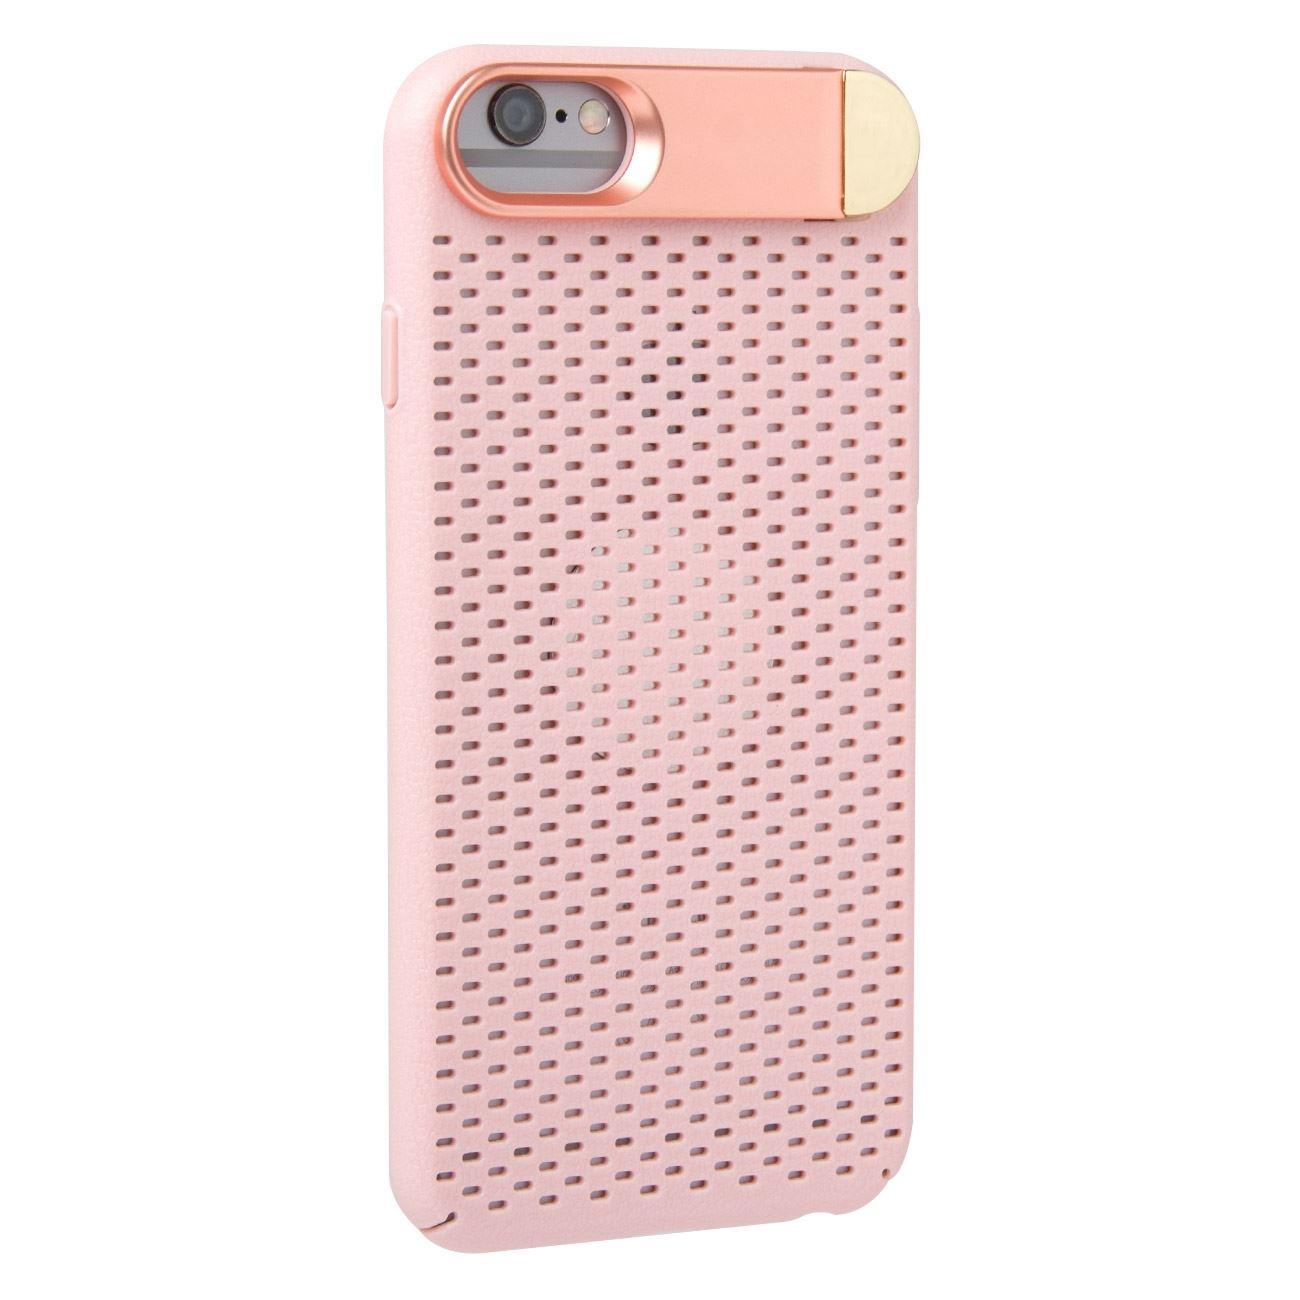 daede9f1af Θήκη Κινητού με Stand Ροζ Μεταλλικό   Θήκες IPhone 6 6S 7 8